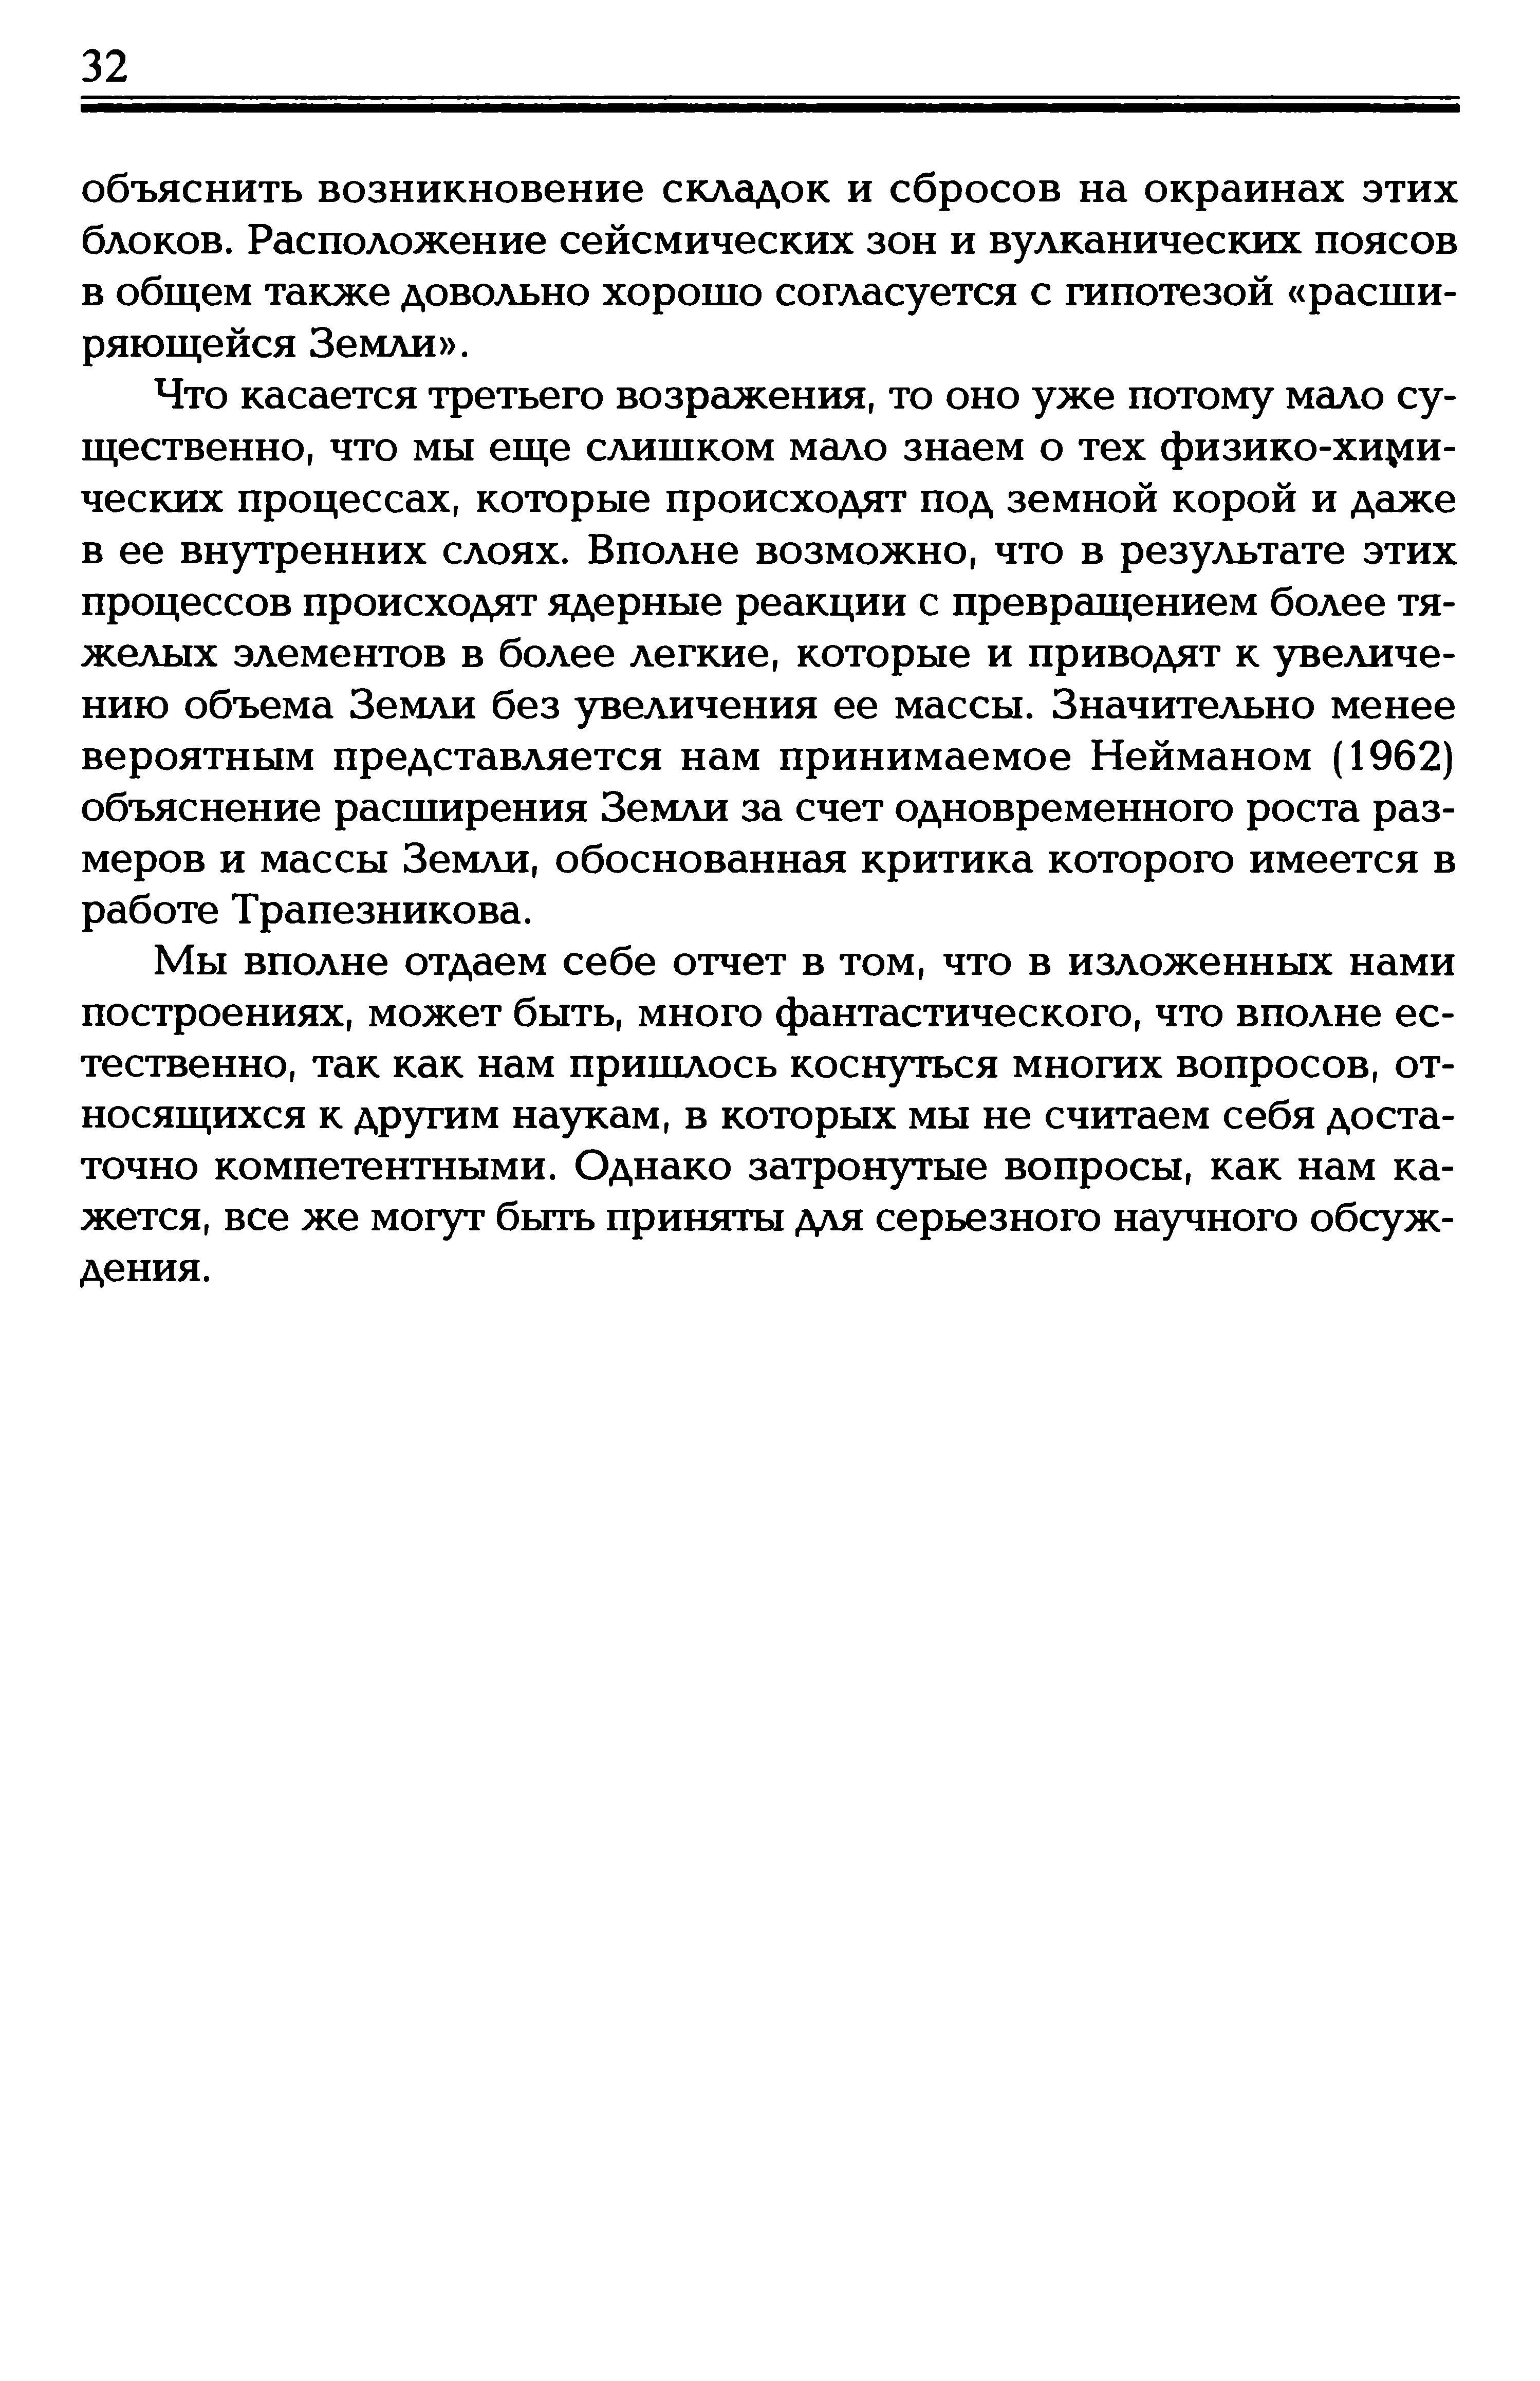 Tzvelev, 2005_1_13.jpeg